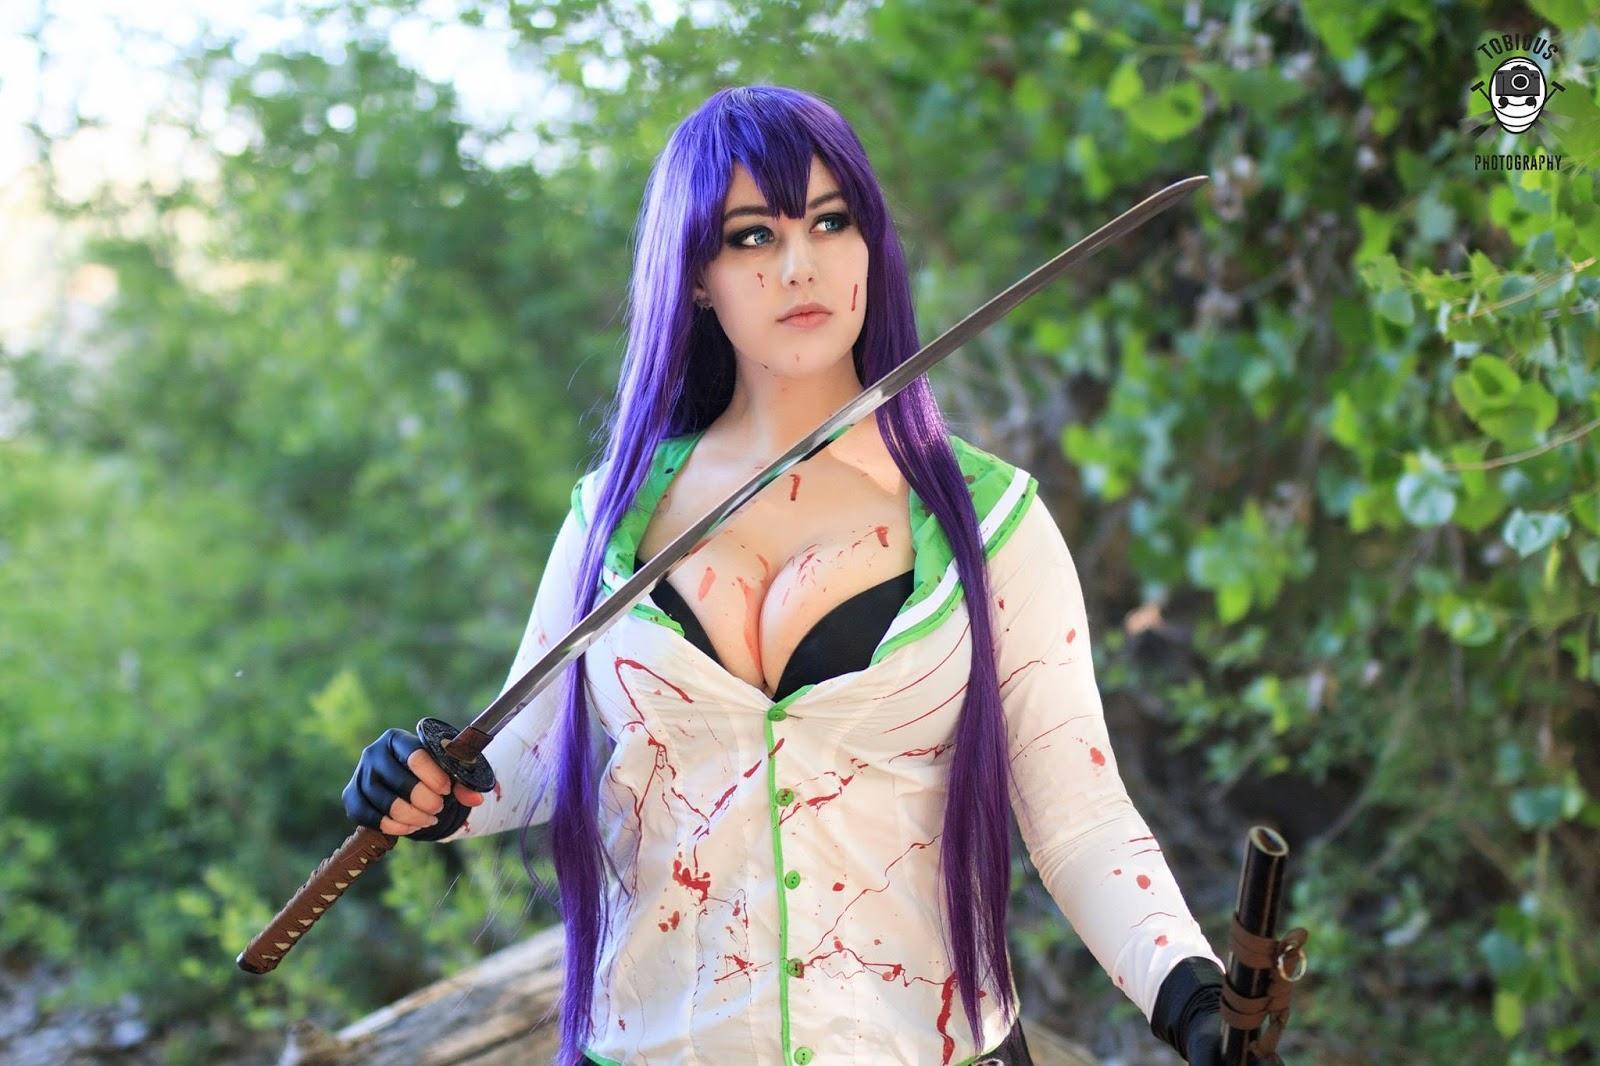 saeko busujima hot cosplayers